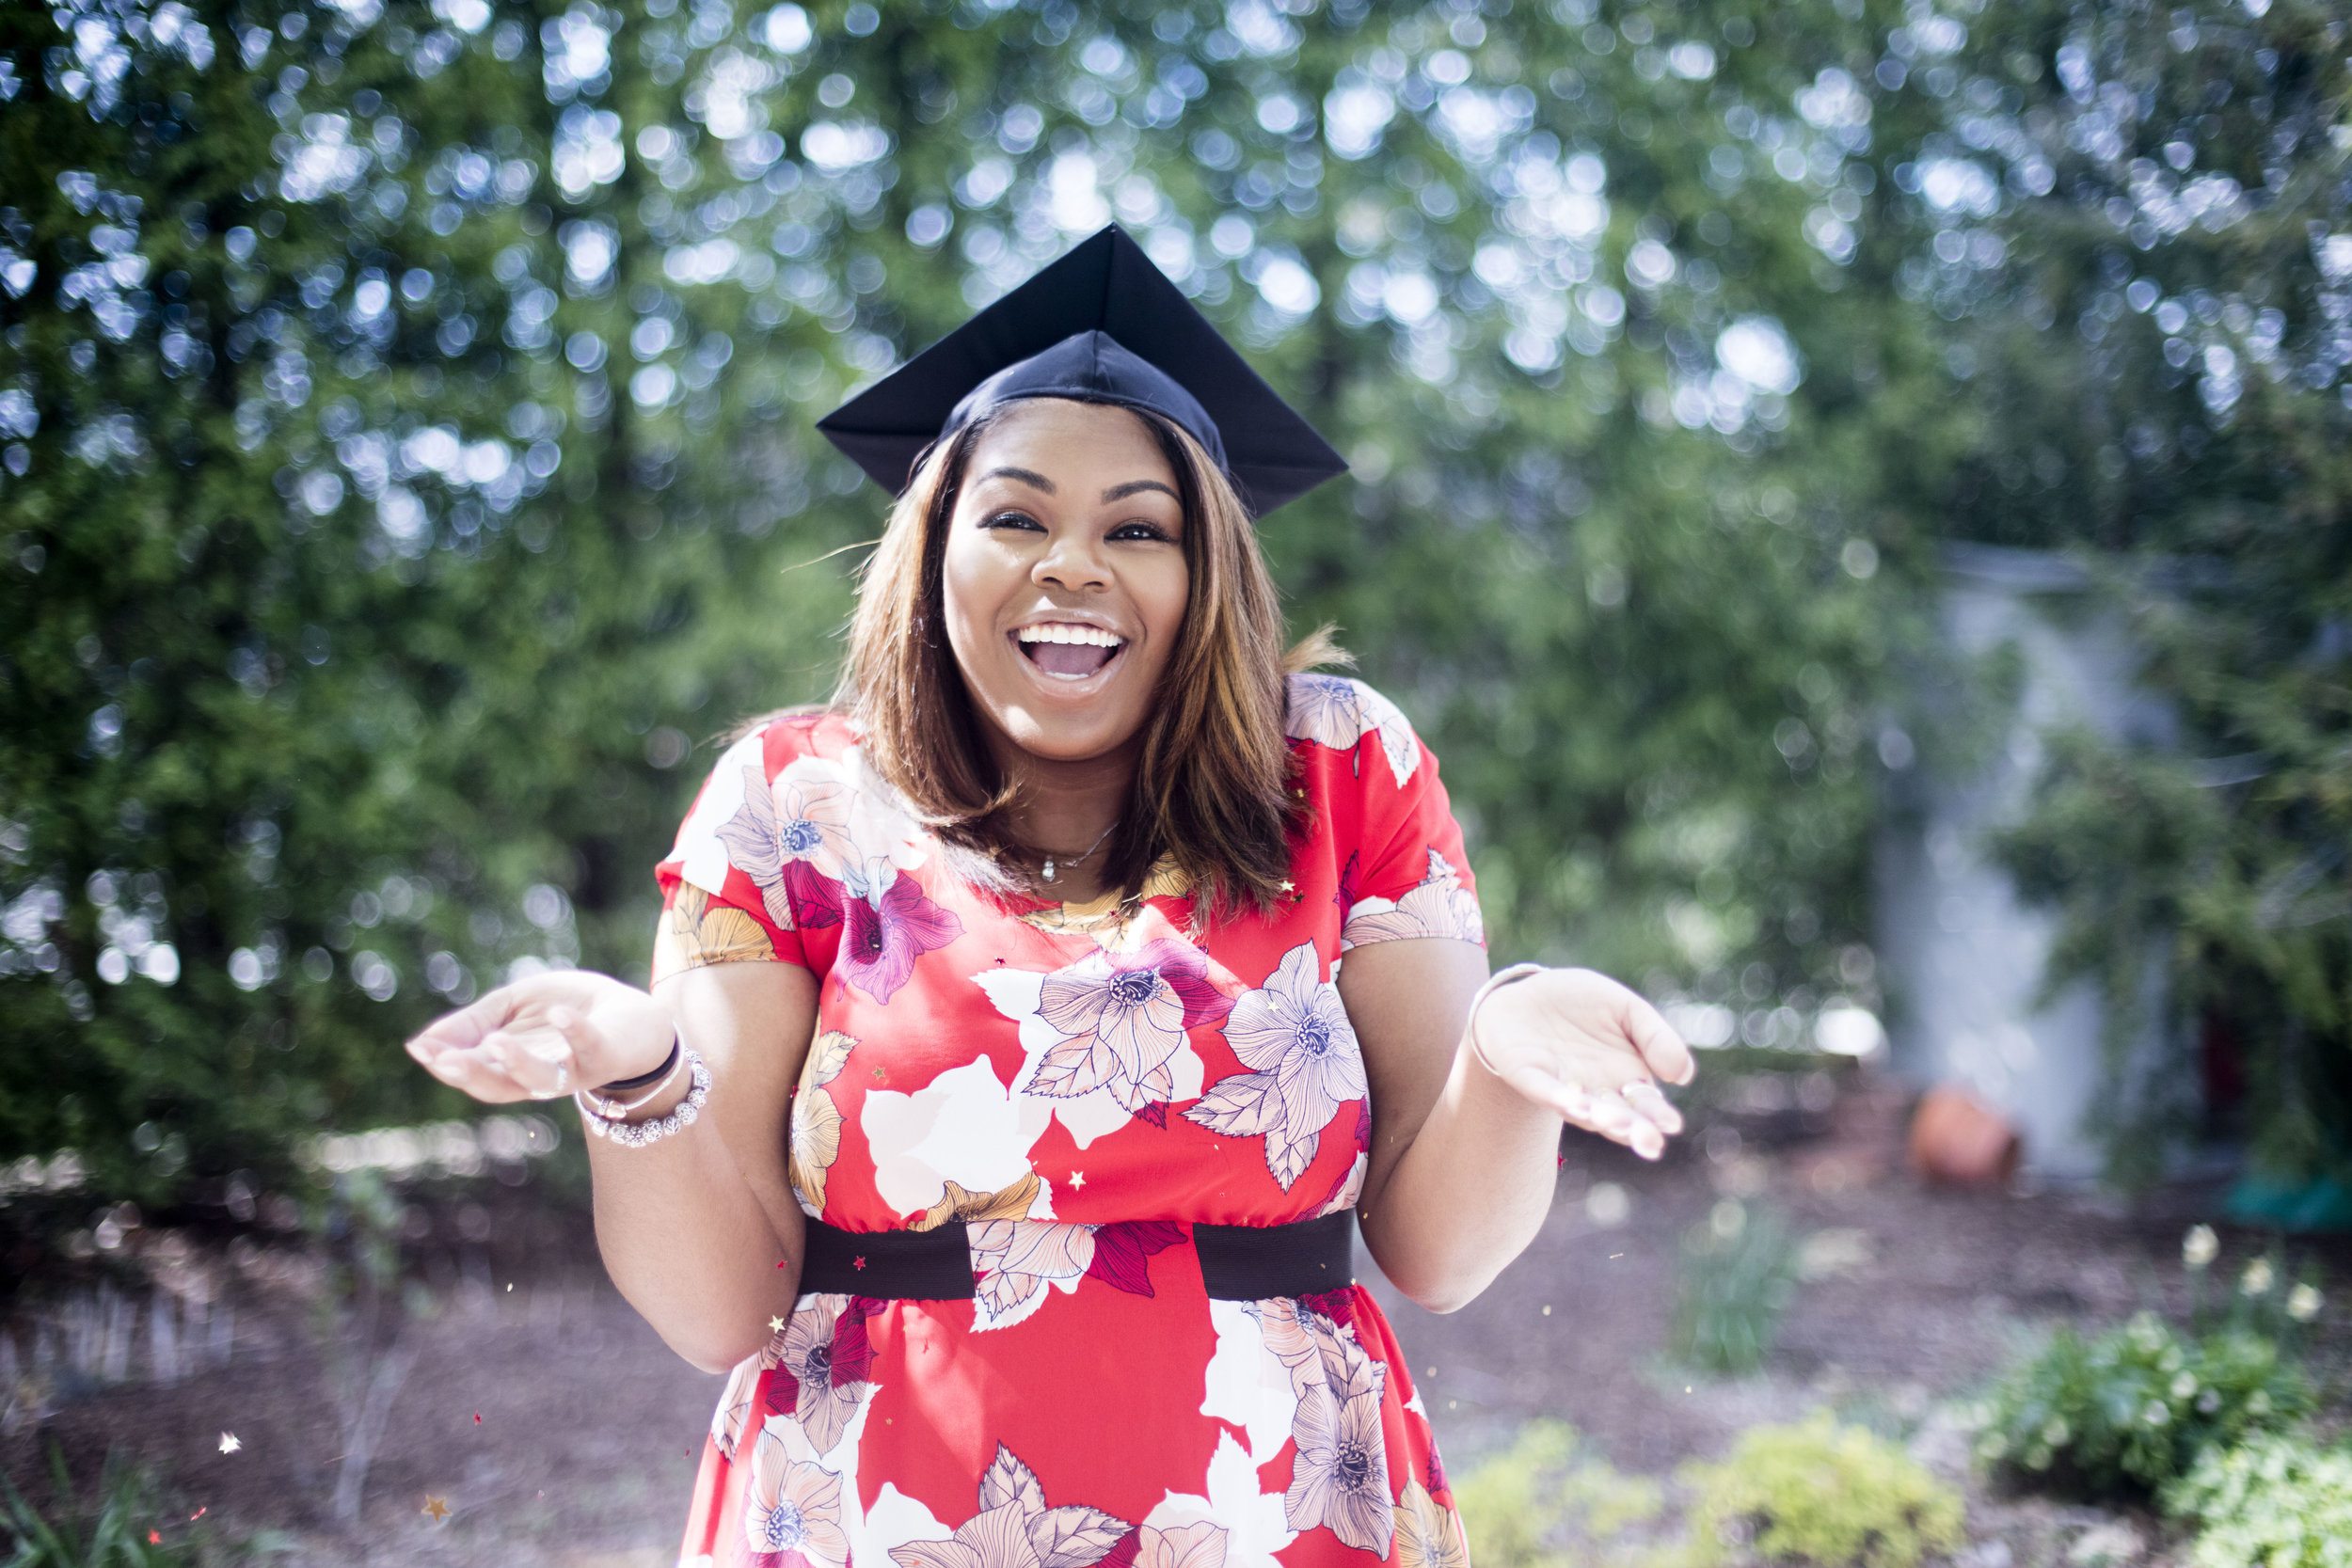 A smiling person in a graduation cap